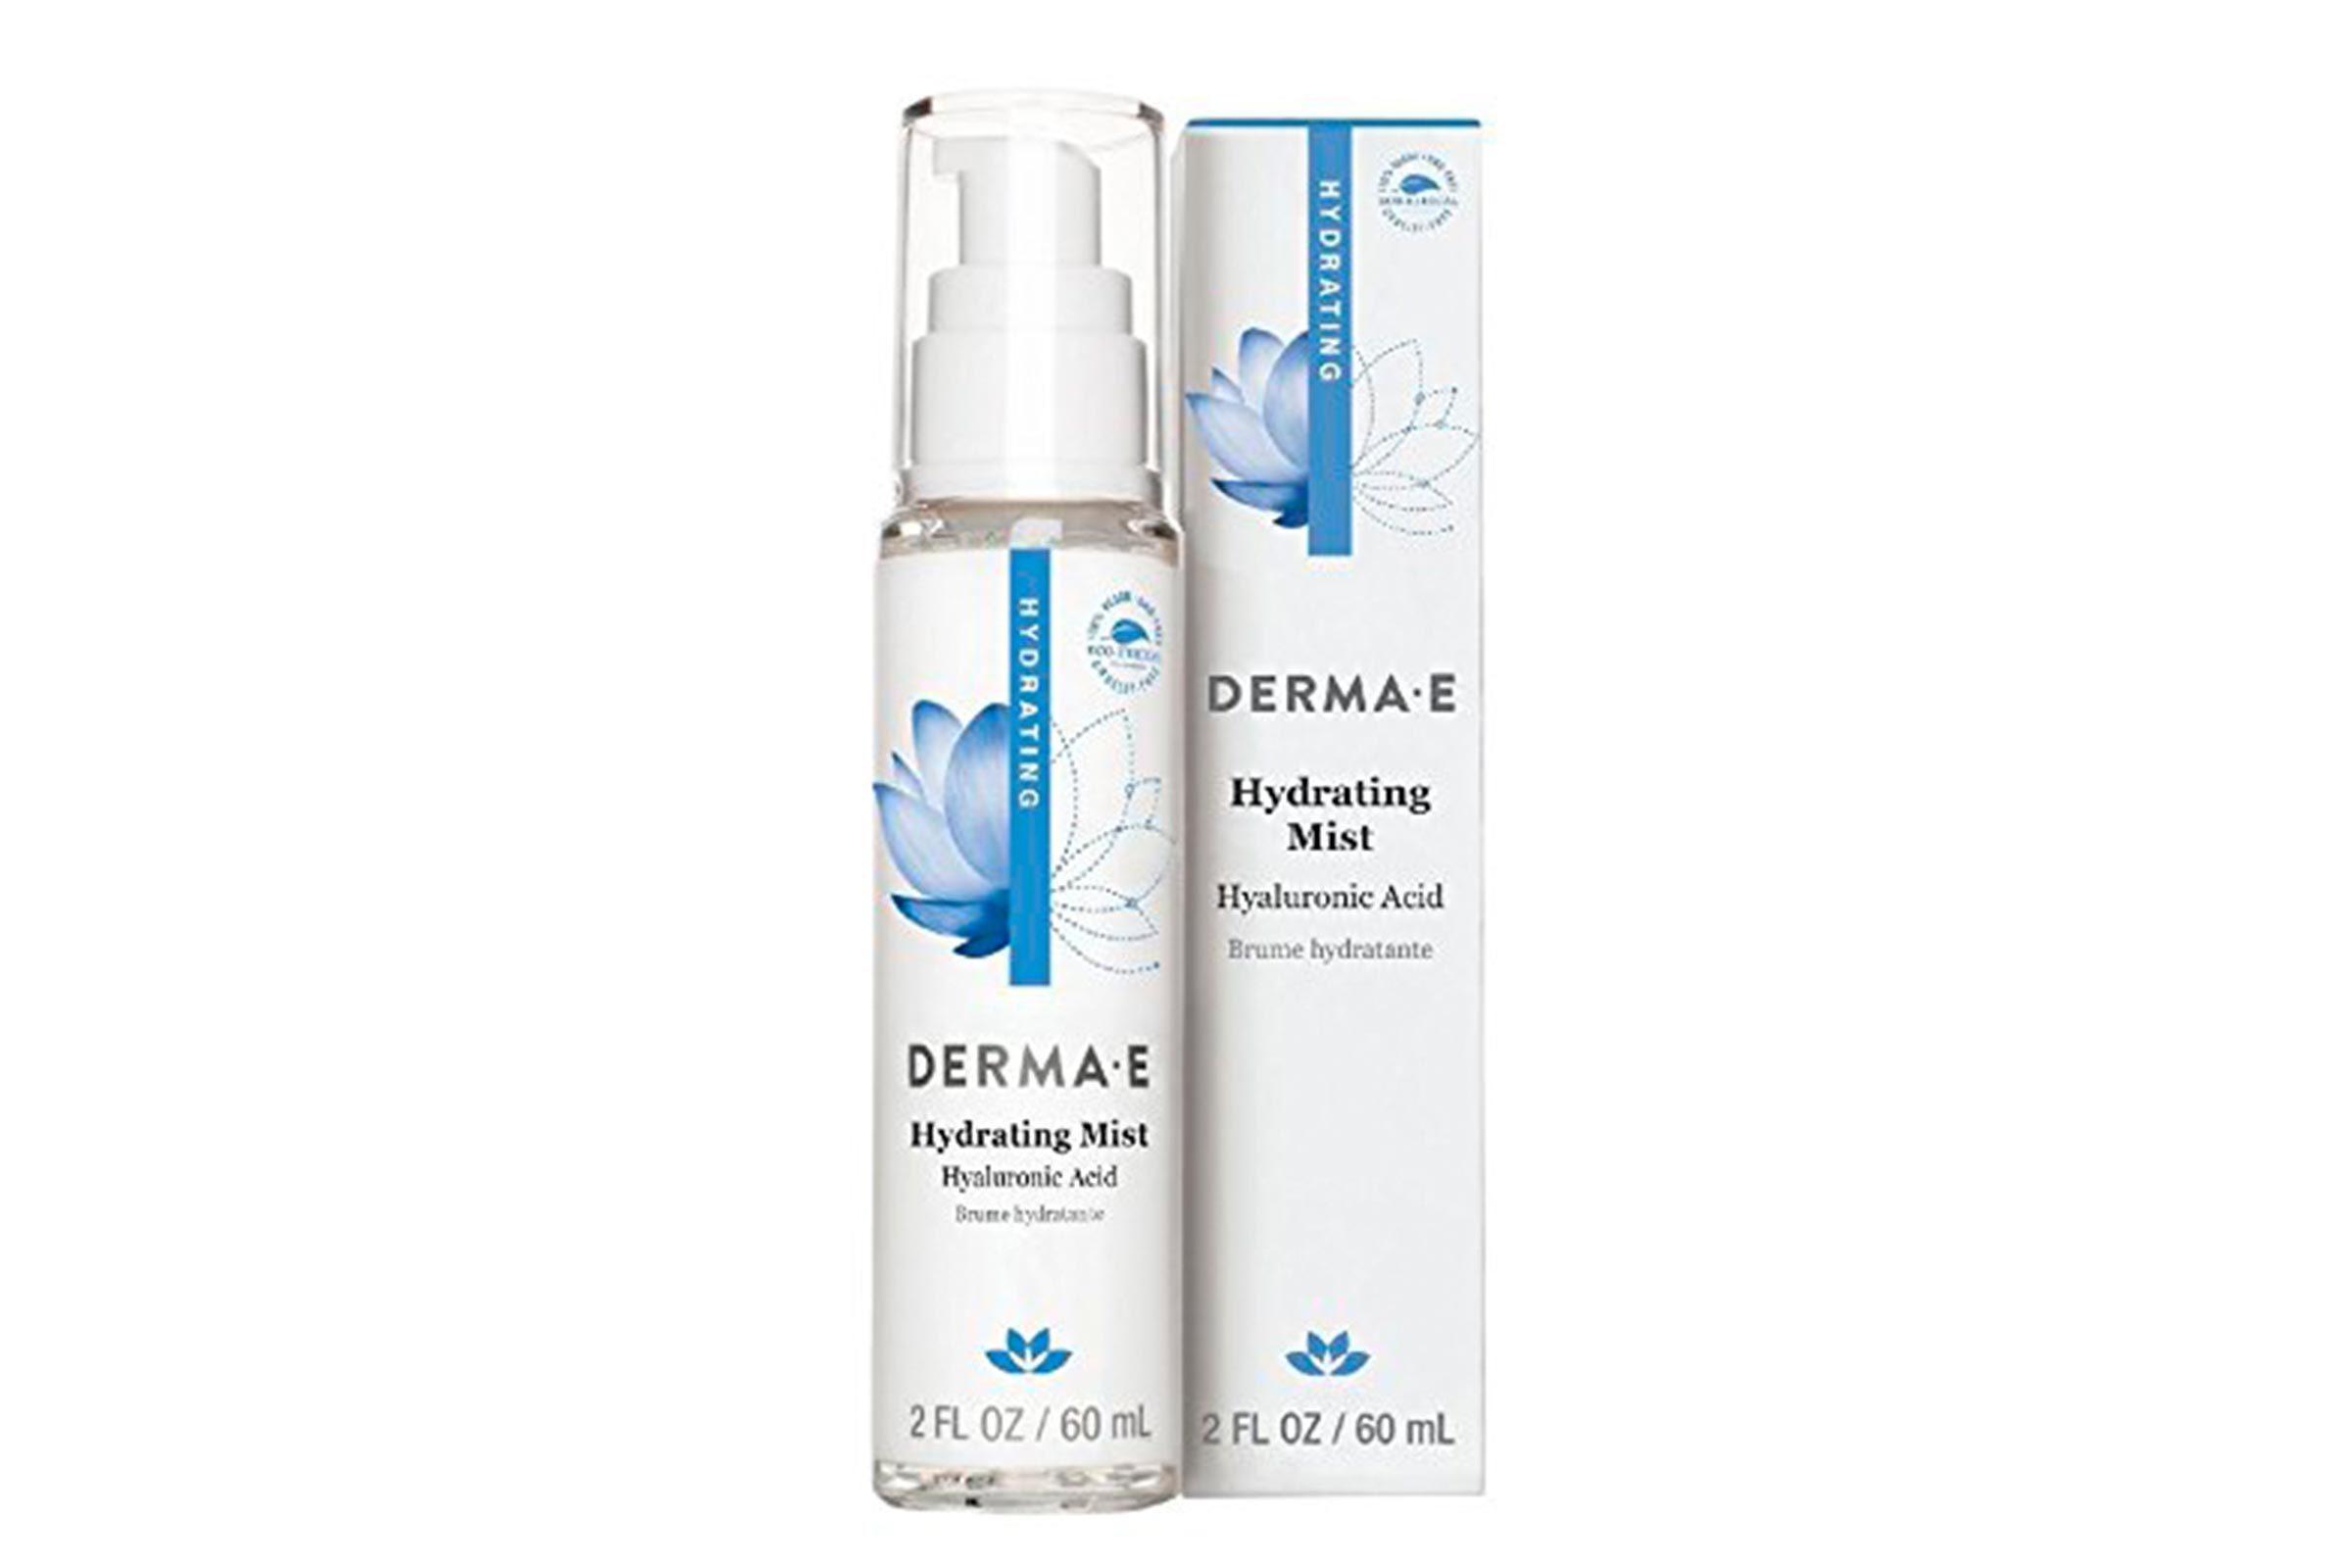 Derma-e hydrating mist